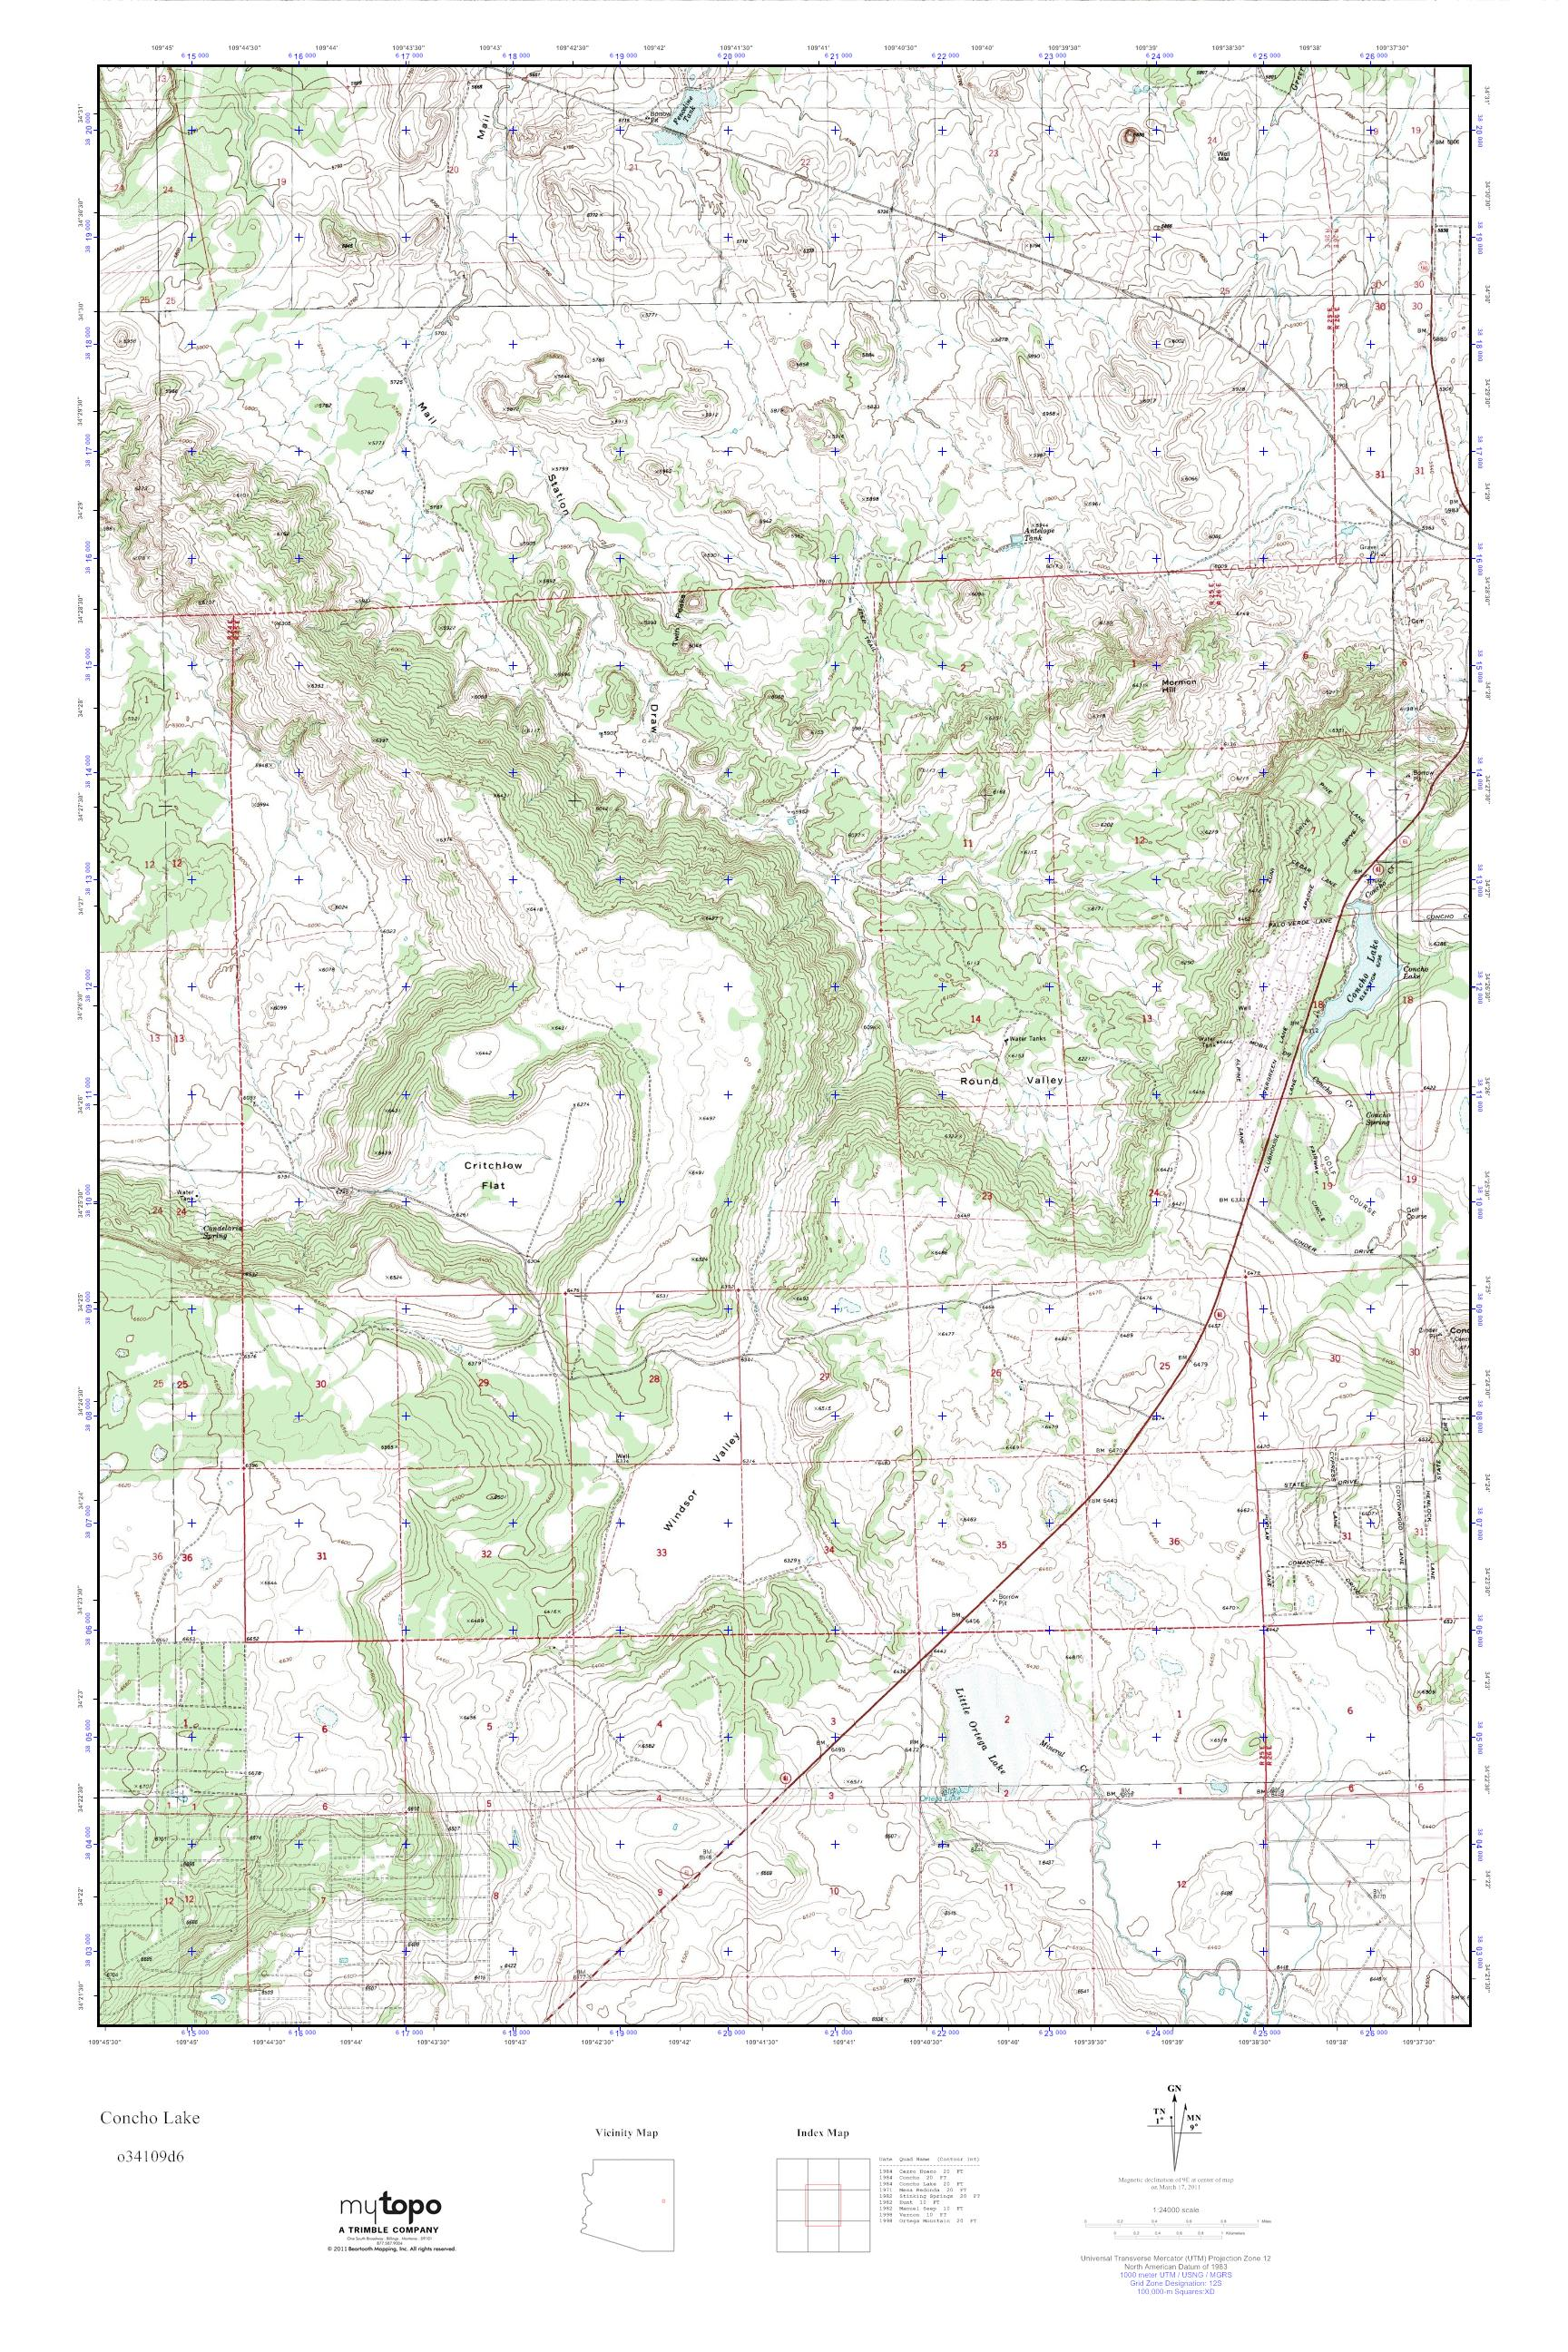 Concho Arizona Map.Mytopo Concho Lake Arizona Usgs Quad Topo Map